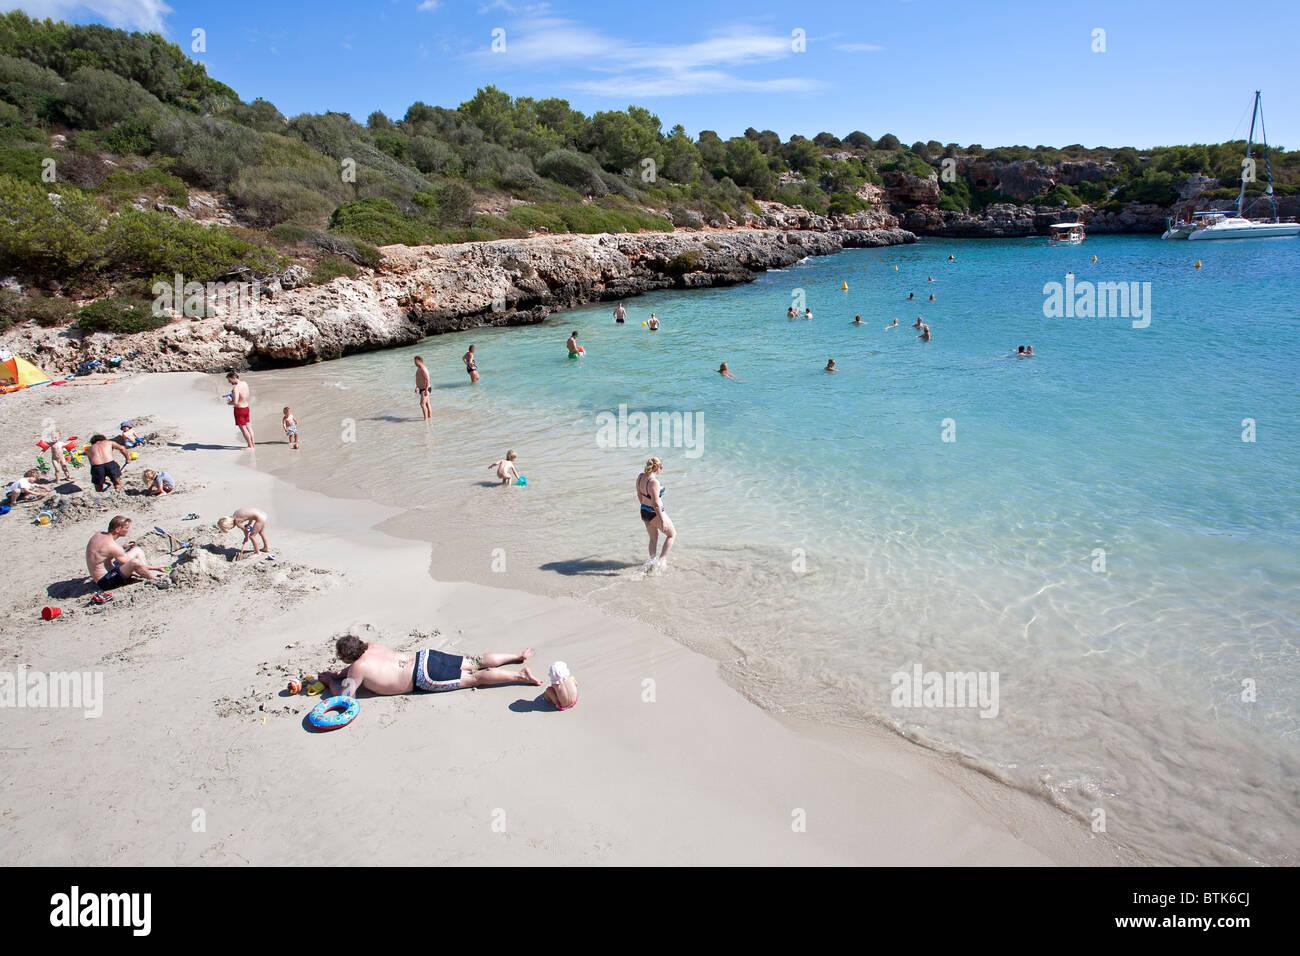 Cala Sa Nau beach. Mallorca Island. Spain - Stock Image